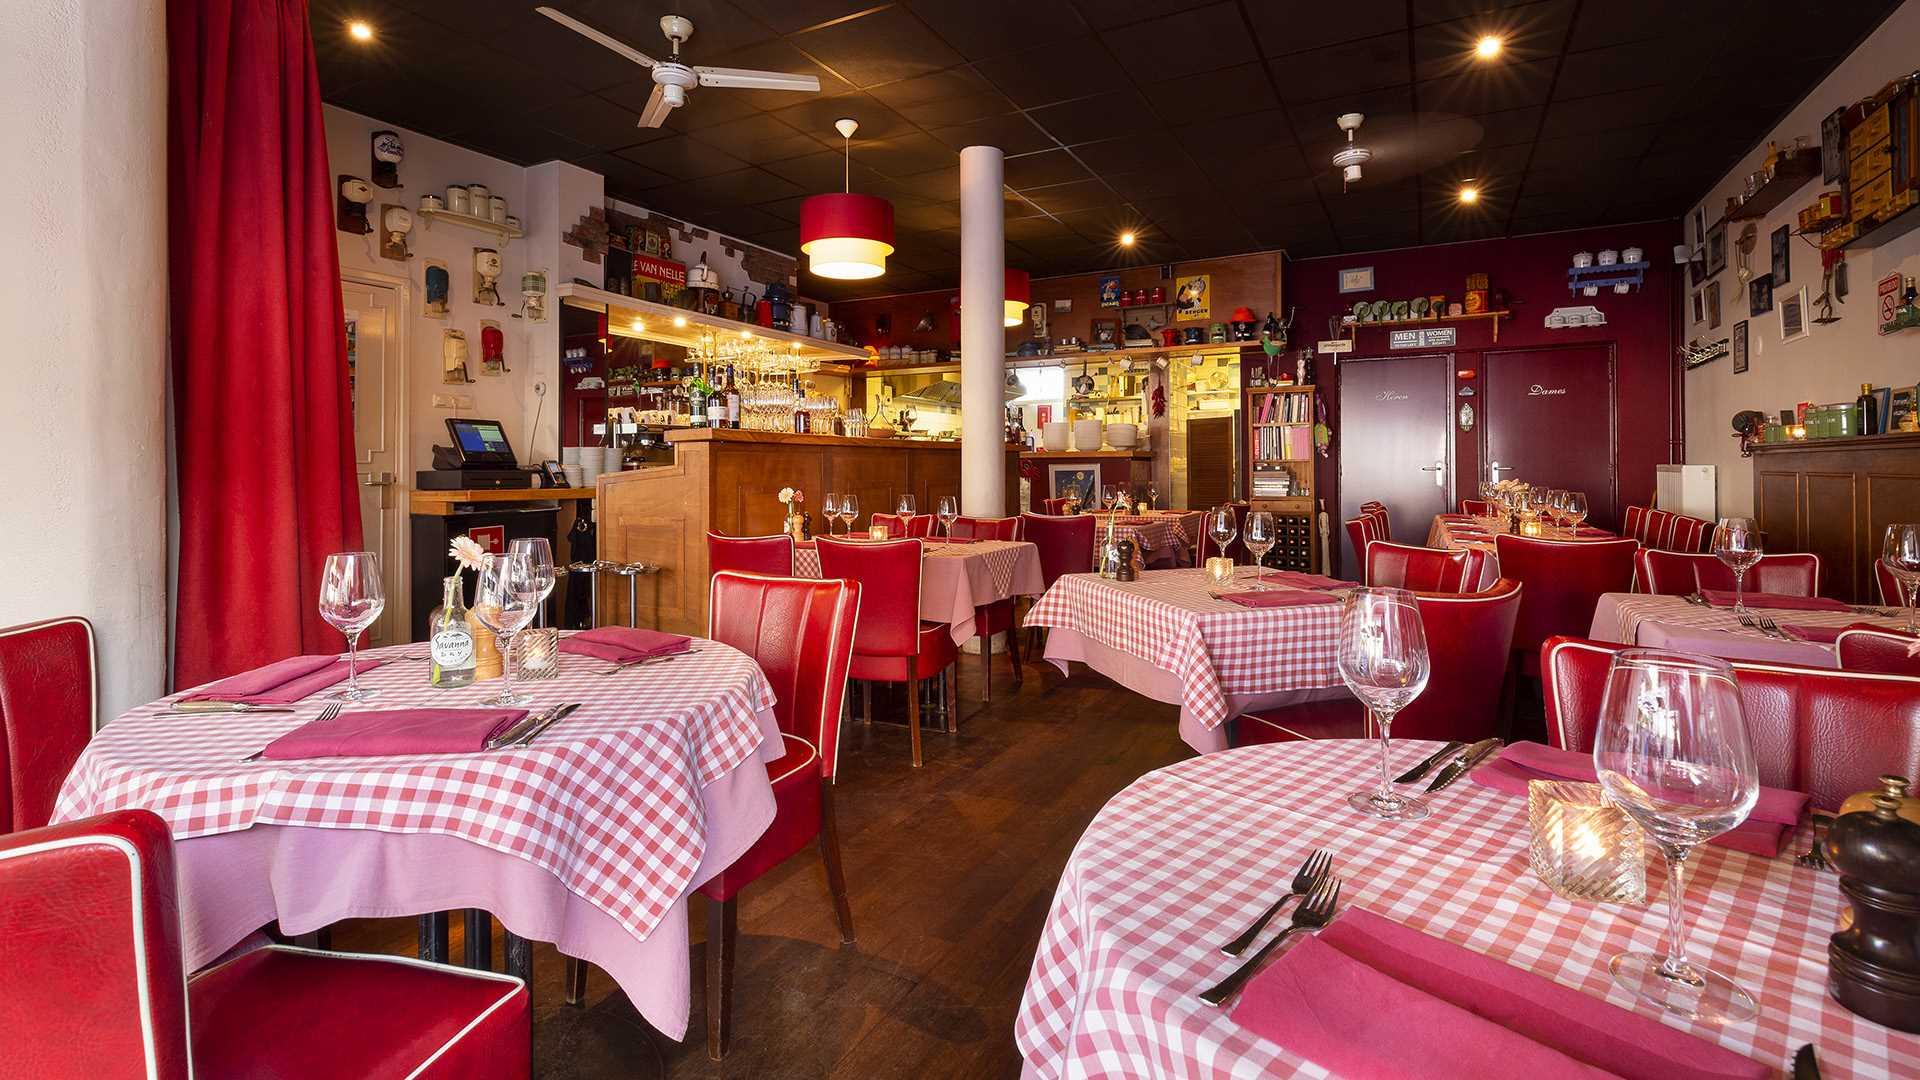 (c) Brasseriesurplace.nl